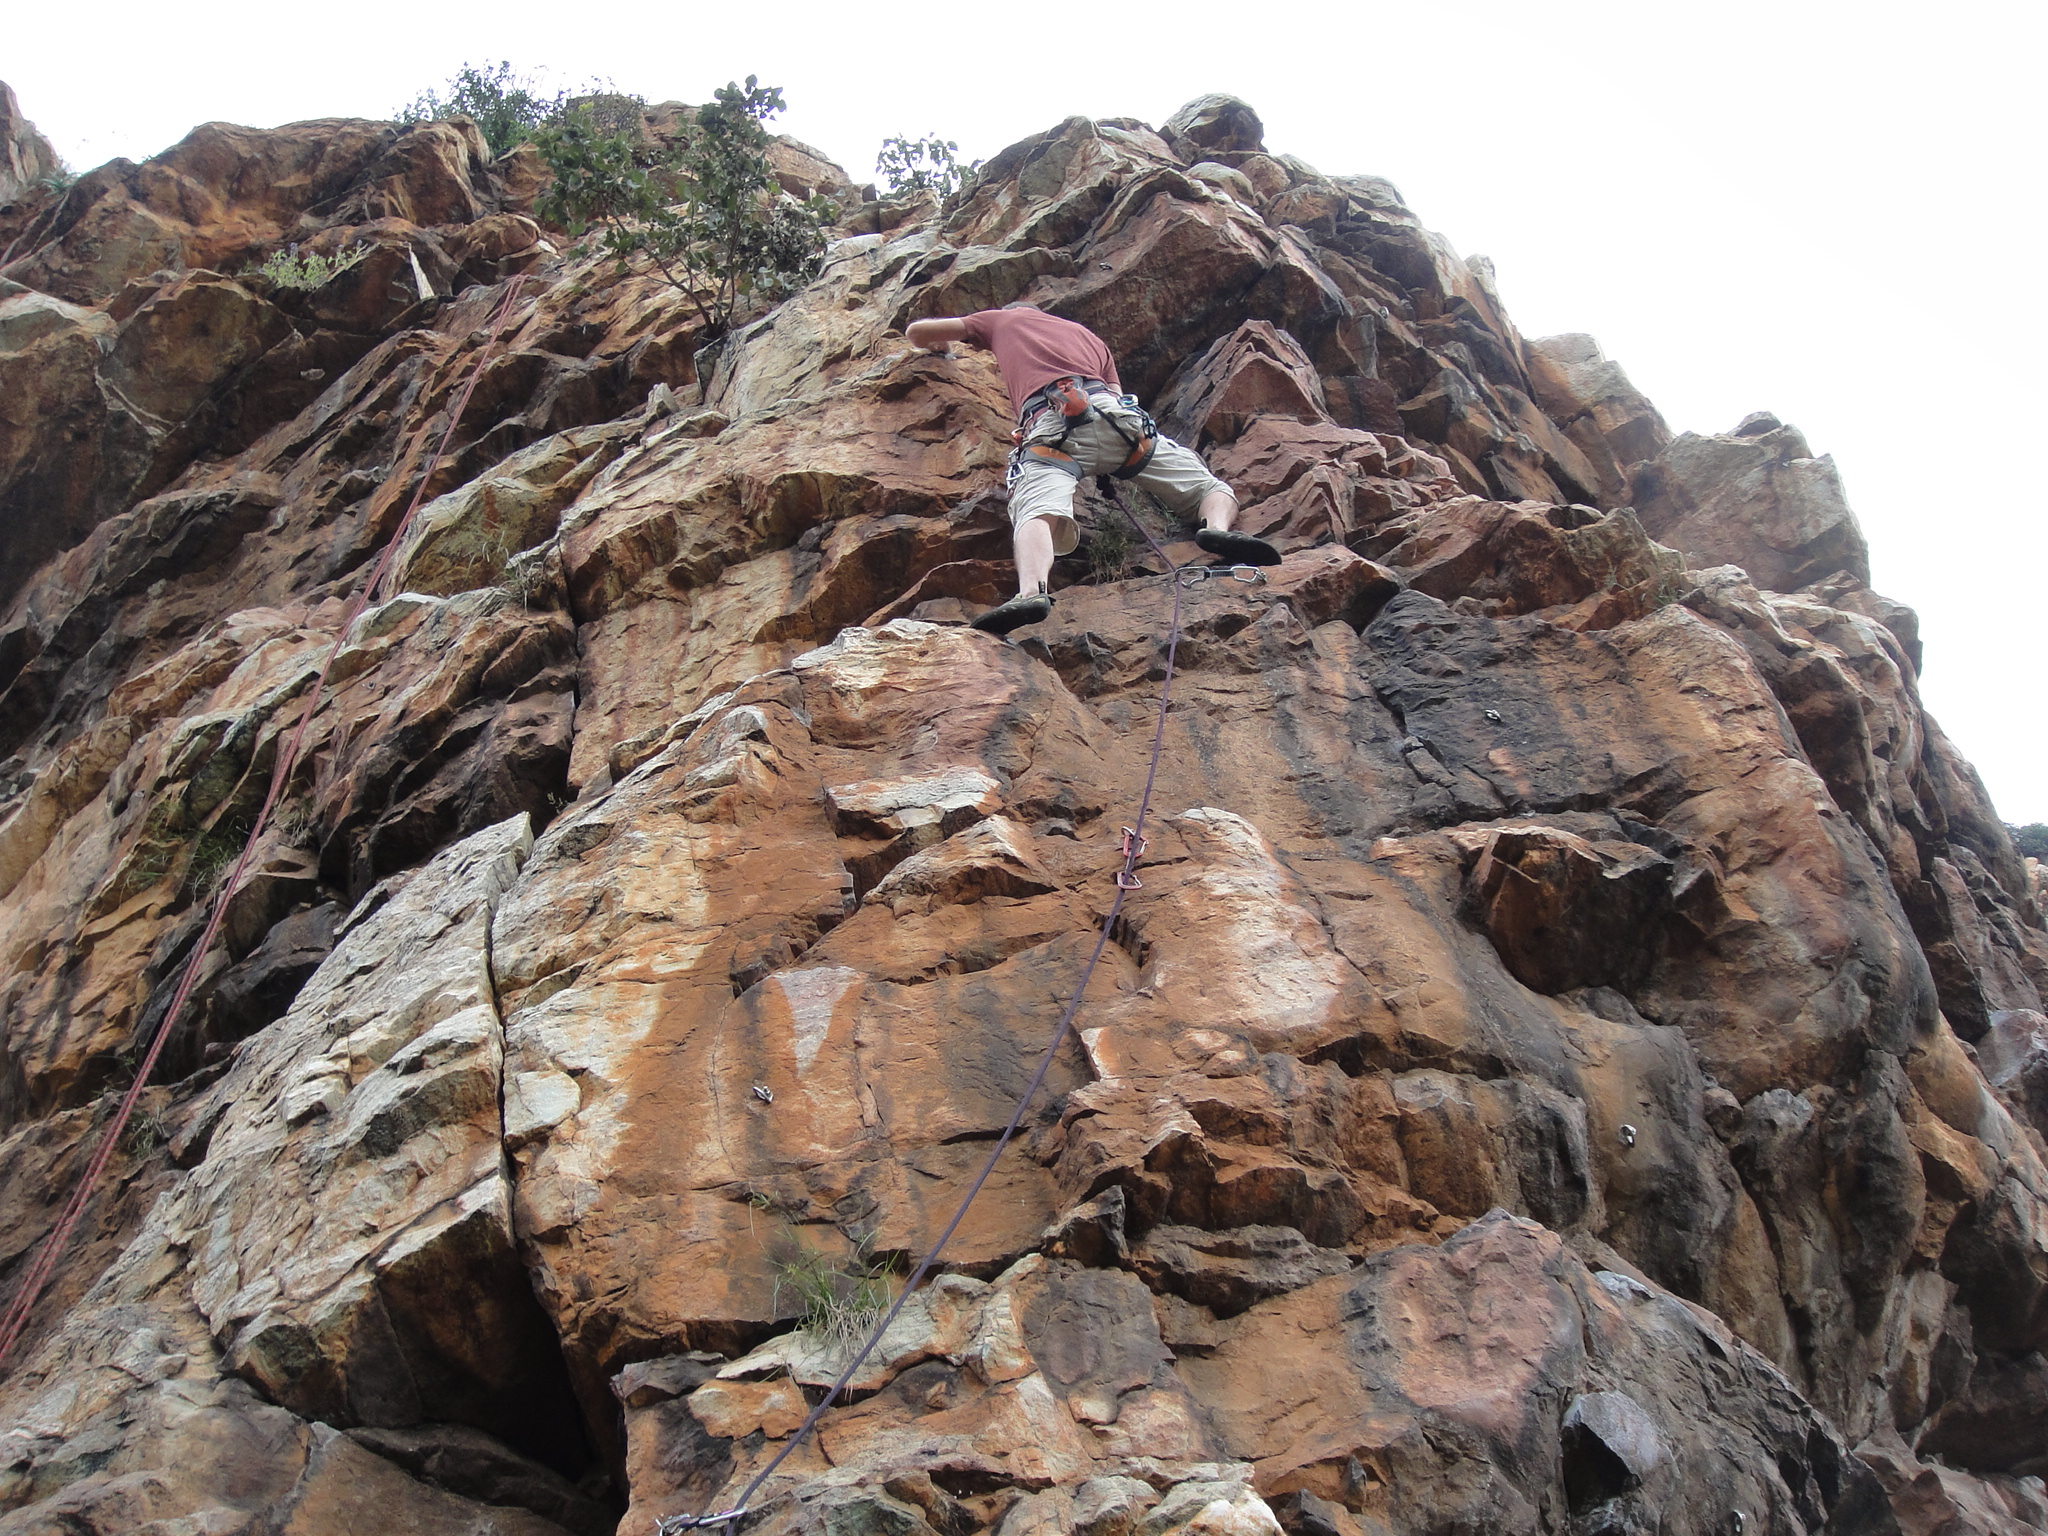 Rock Climbing at Kings Kloof, Krugersdorp